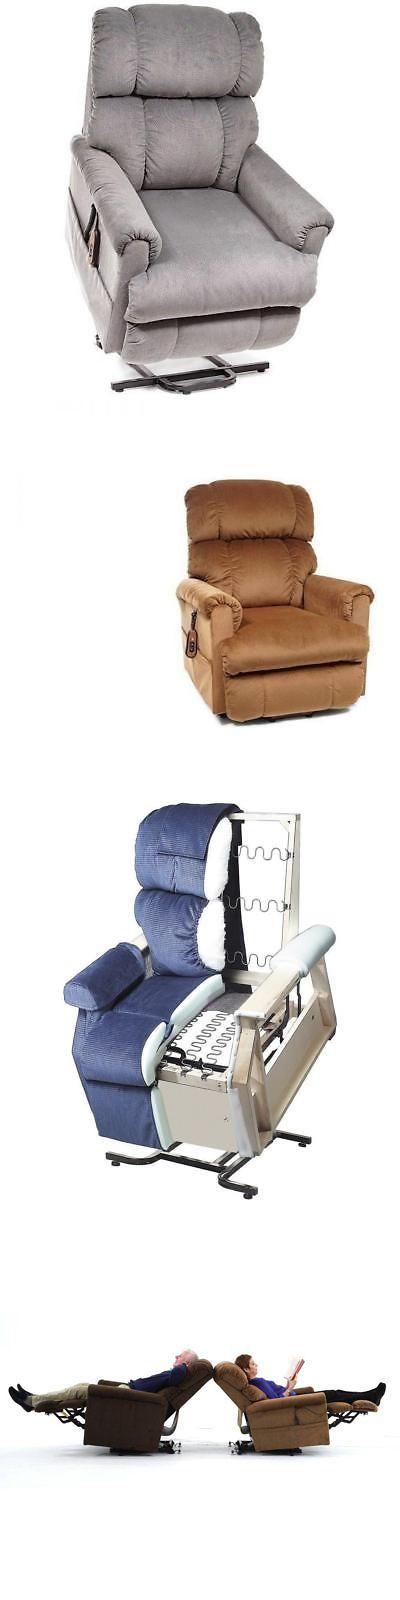 Electric Massage Chairs: Golden Tech Pr 931 Lar Space Saver Large Lift Chair